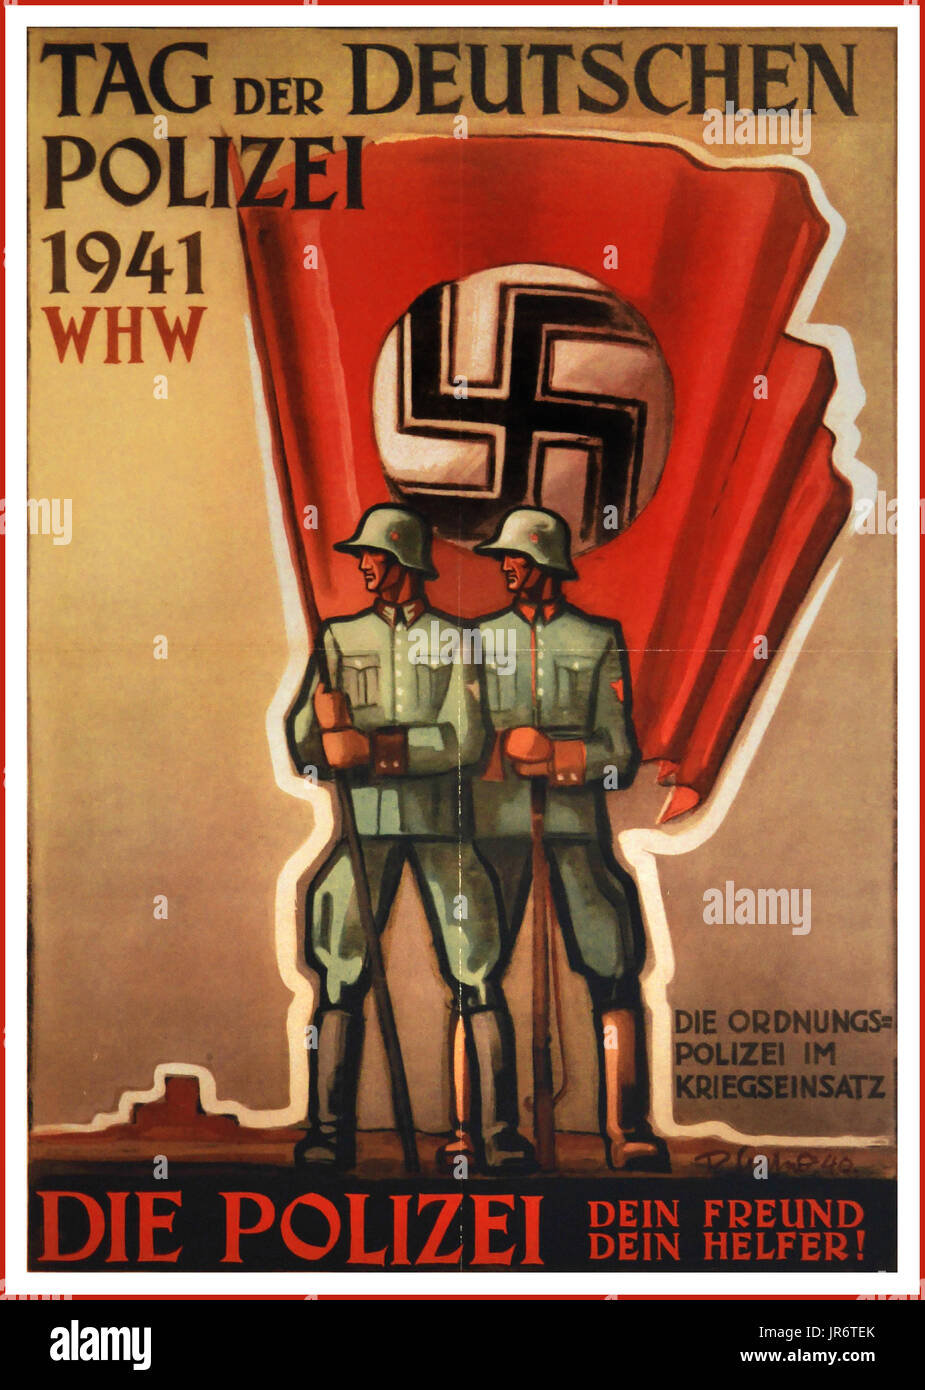 Swastika Flag World War 2 Stock Photos & Swastika Flag World